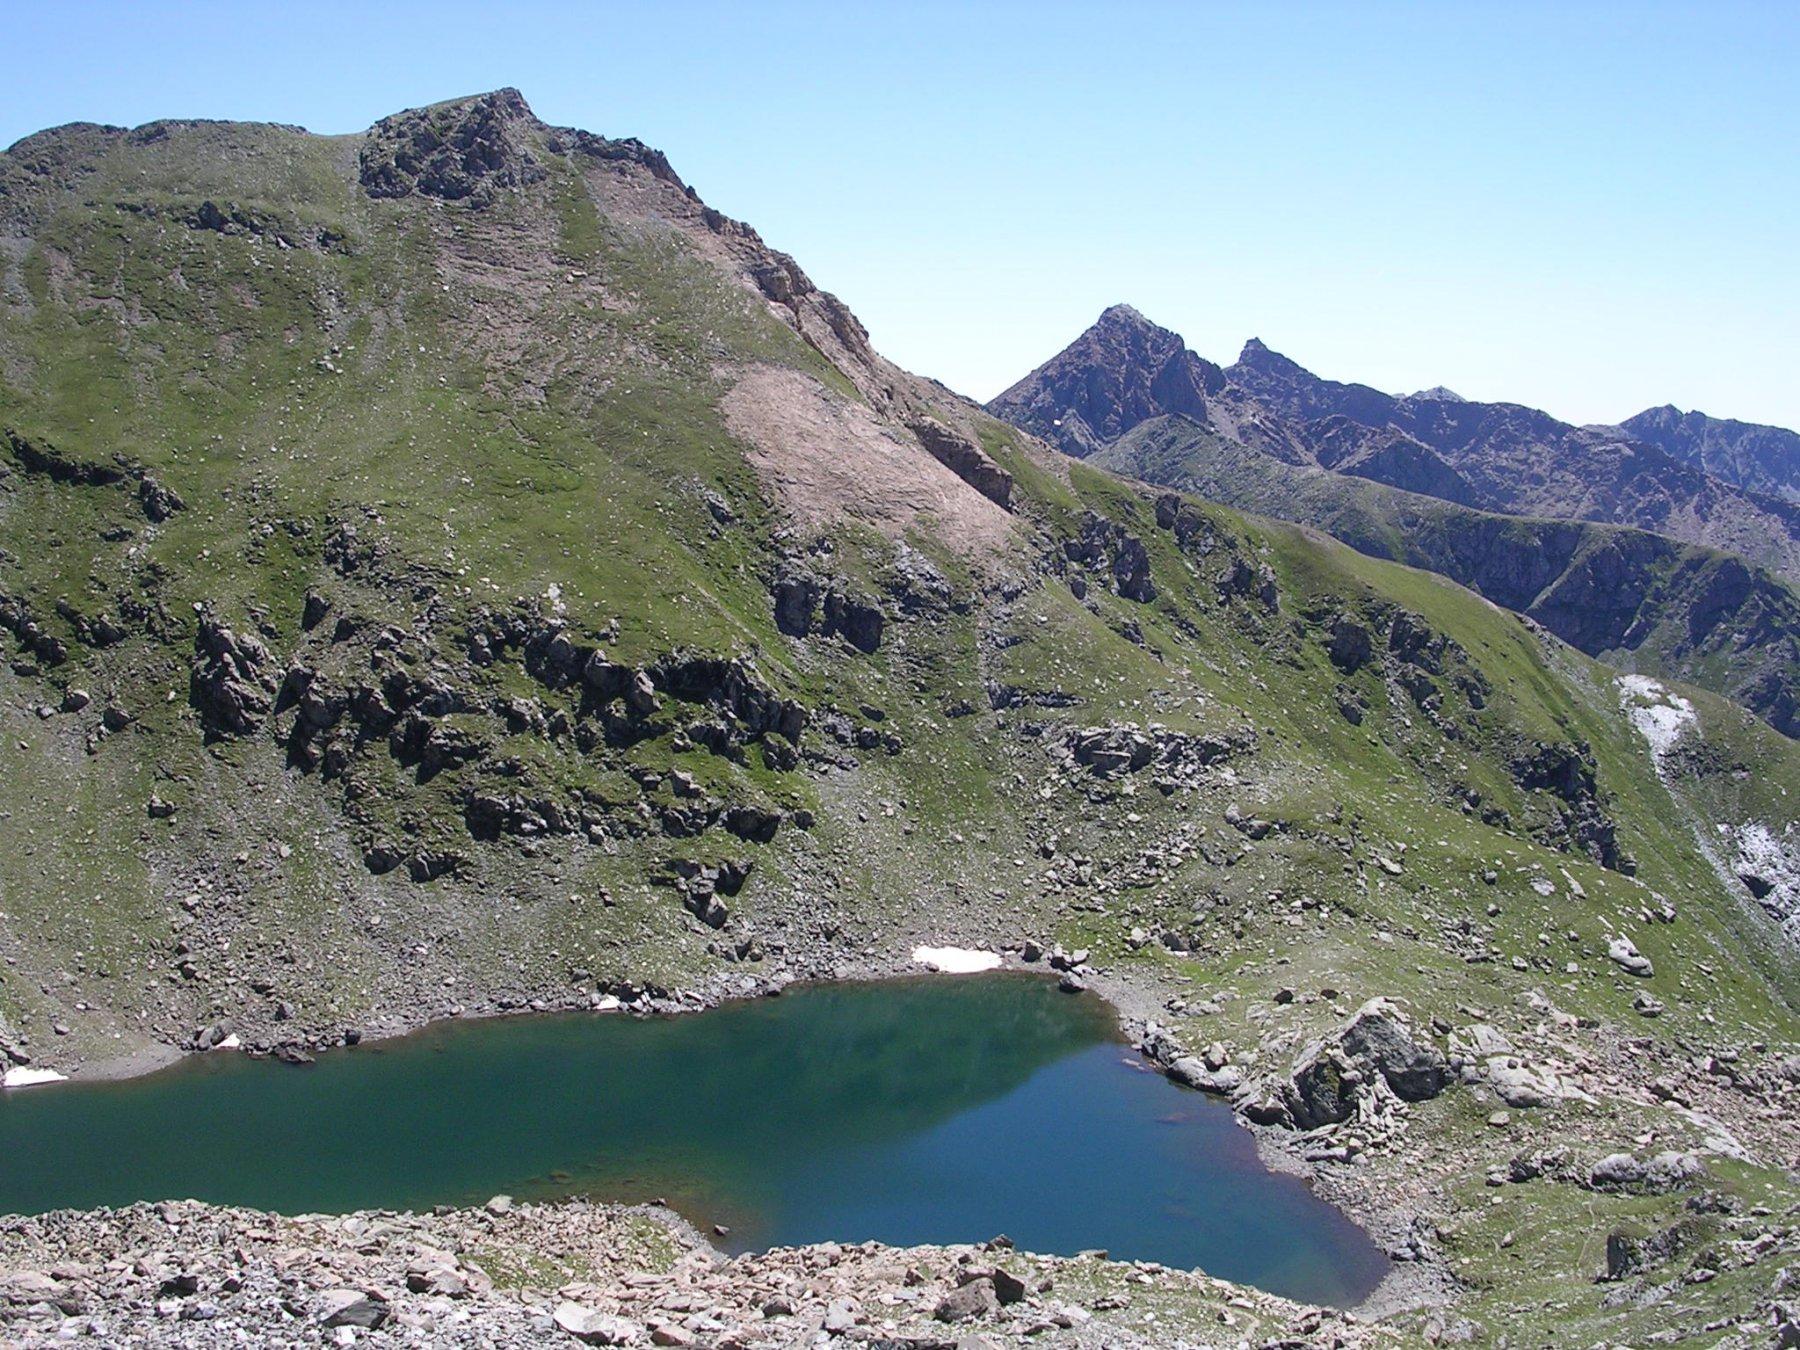 Il lago Chardonnay